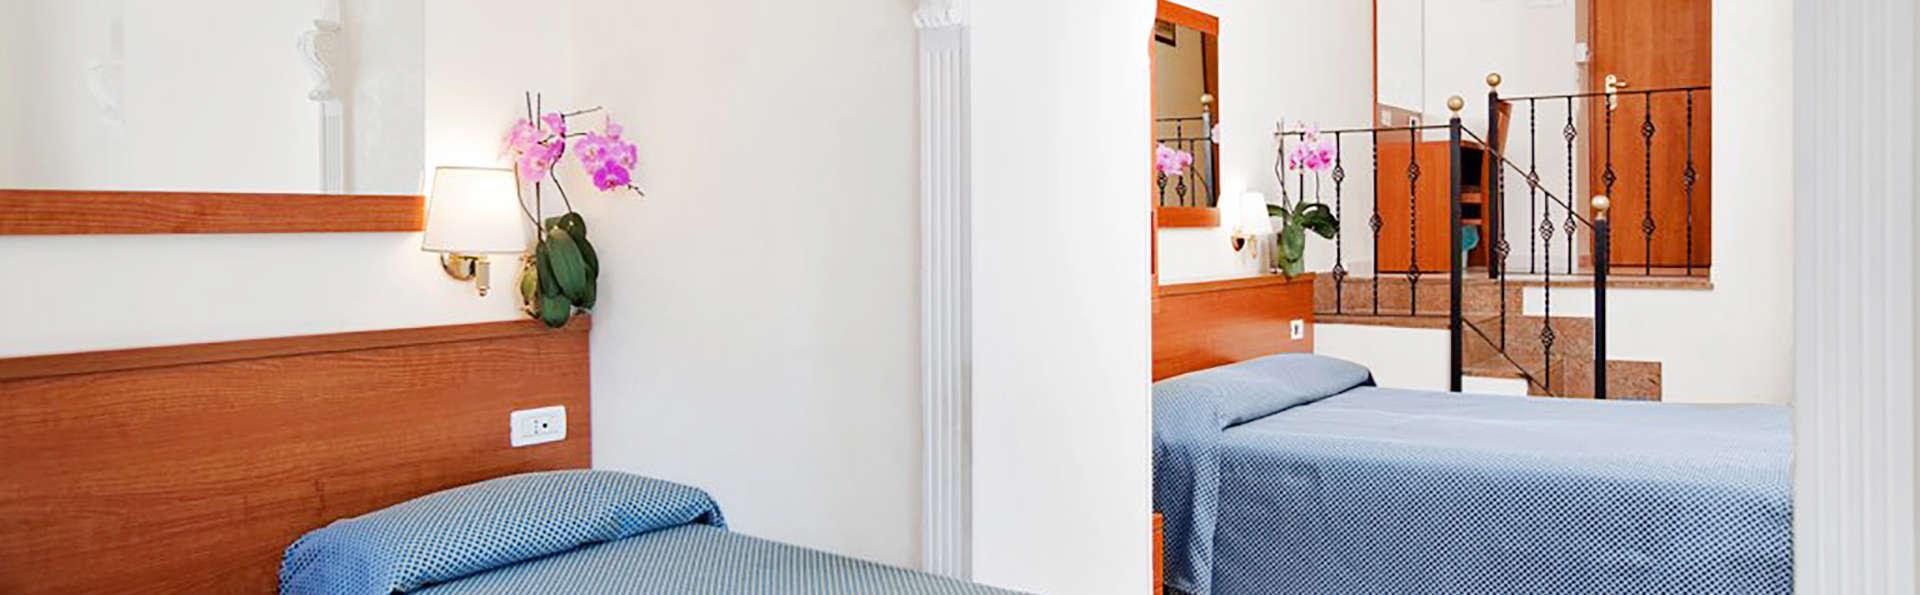 Hotel delle Muse - Edit_Room7.jpg